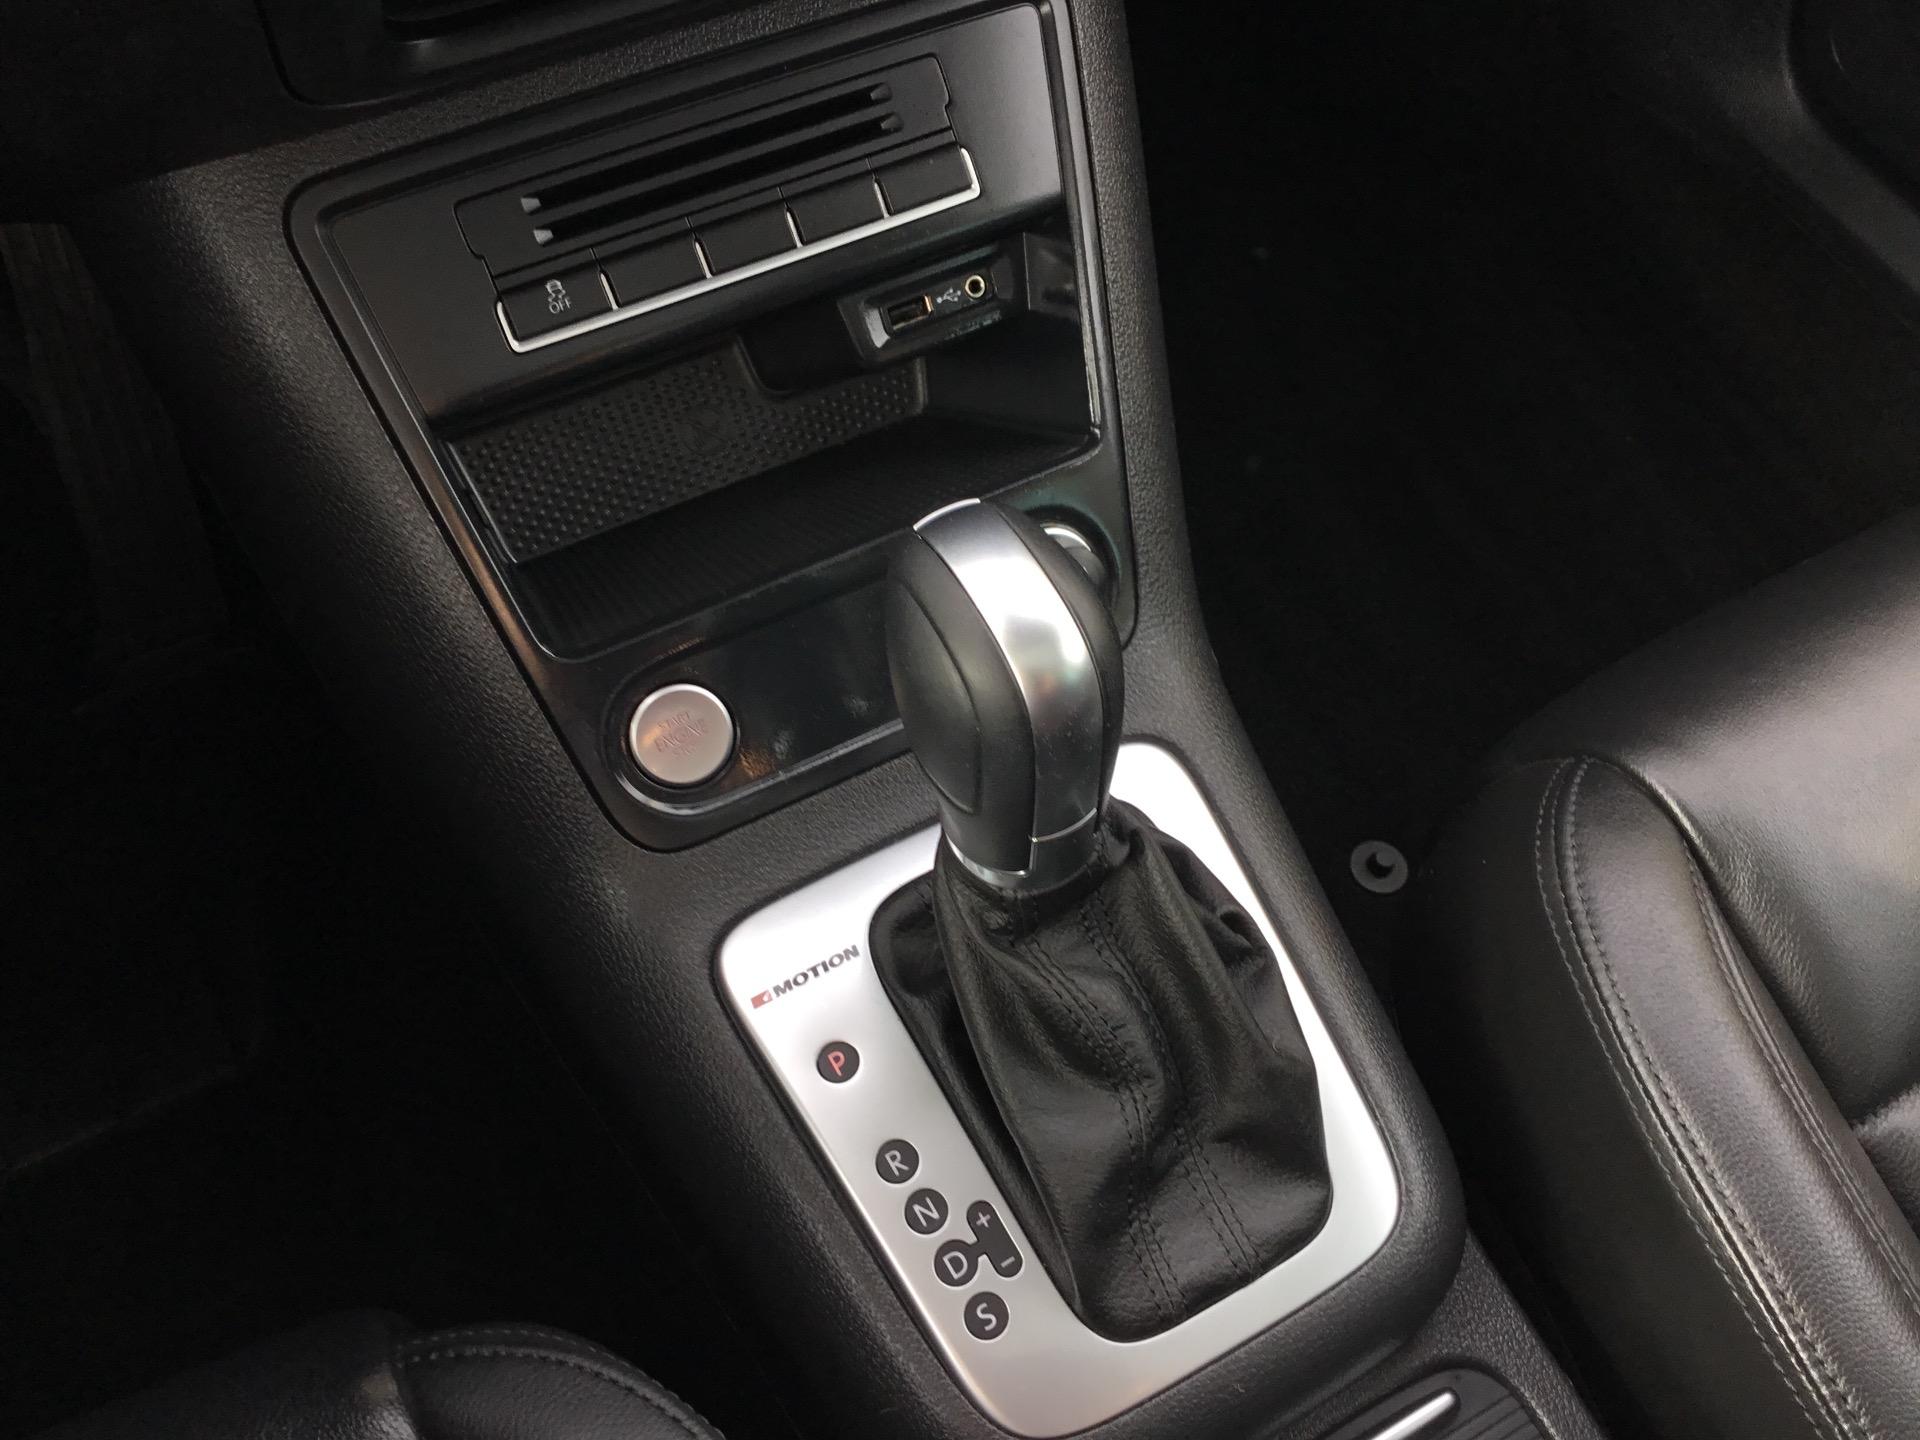 Used-2016-Volkswagen-Tiguan-20T-SEL-4Motion